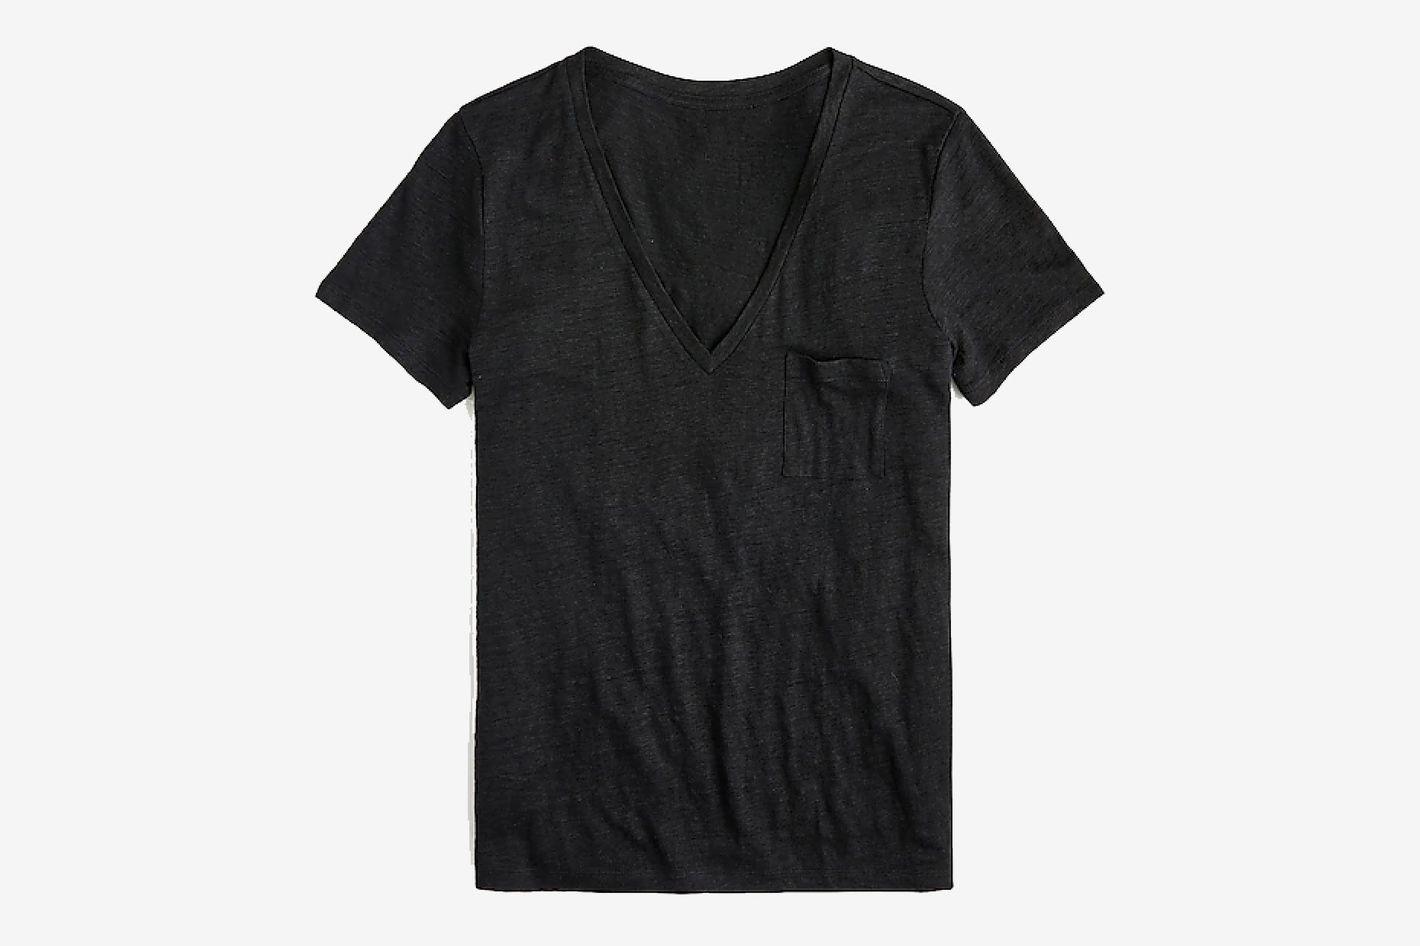 J.Crew Linen V-neck Pocket T-shirt